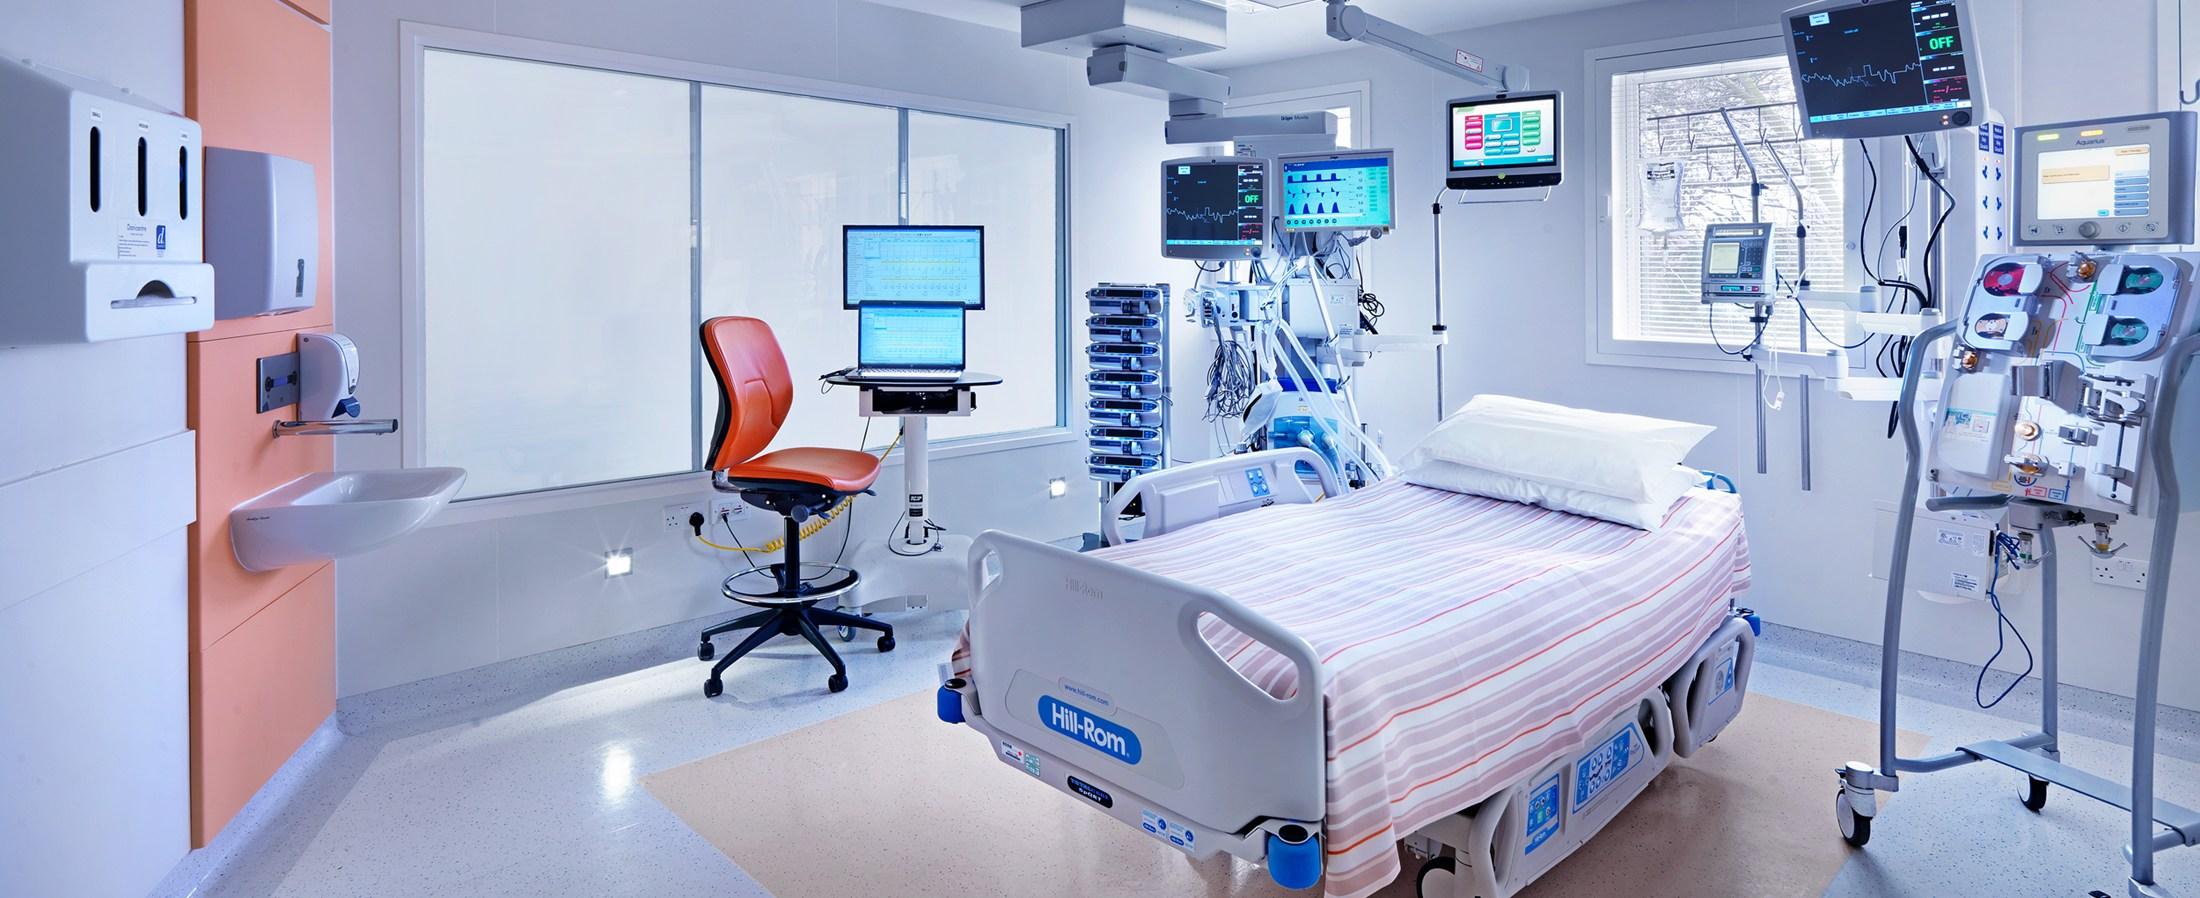 Spital (Wikimedia Commons)